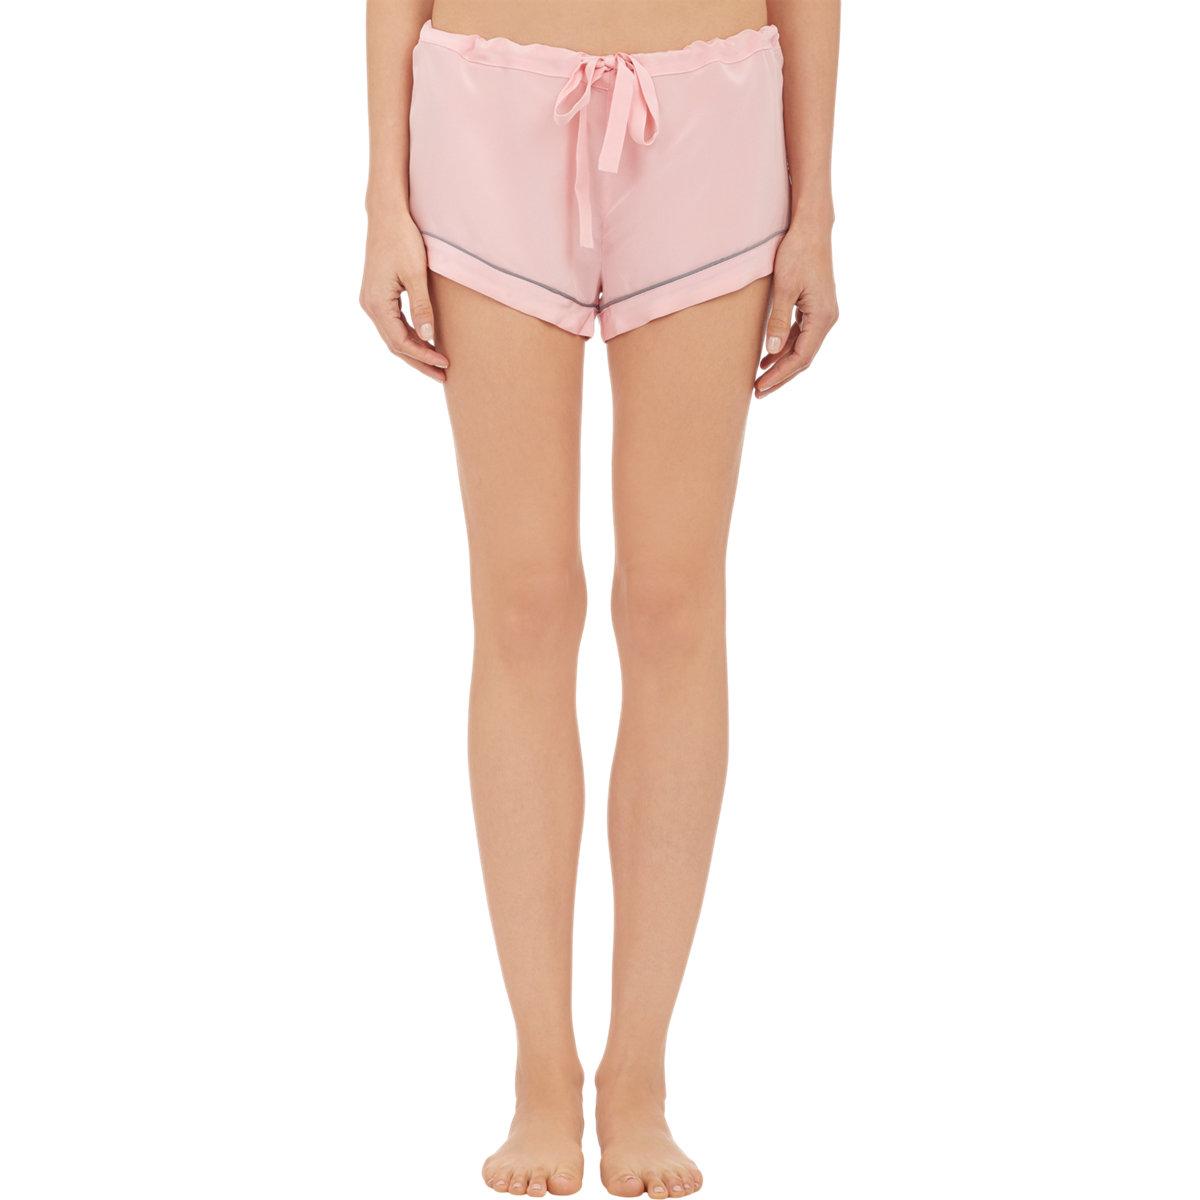 Lyst - Steven Alan Crepe De Chine Drawstring Pajama Shorts in Pink 6a0cb0cbd